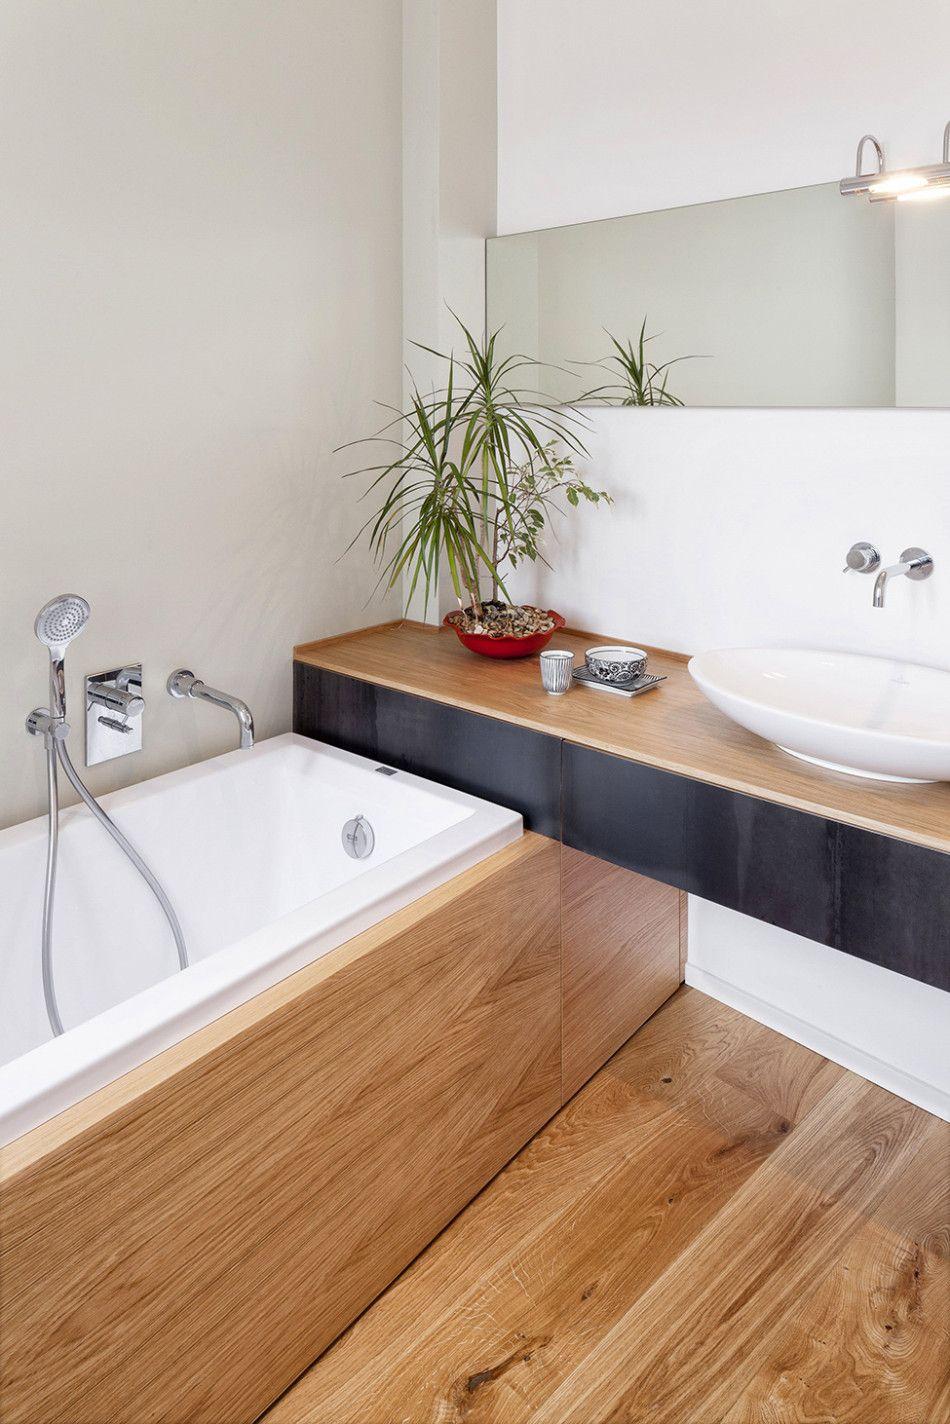 wooden bamboo bathroom details. interior luxury home design. | bad, Hause ideen